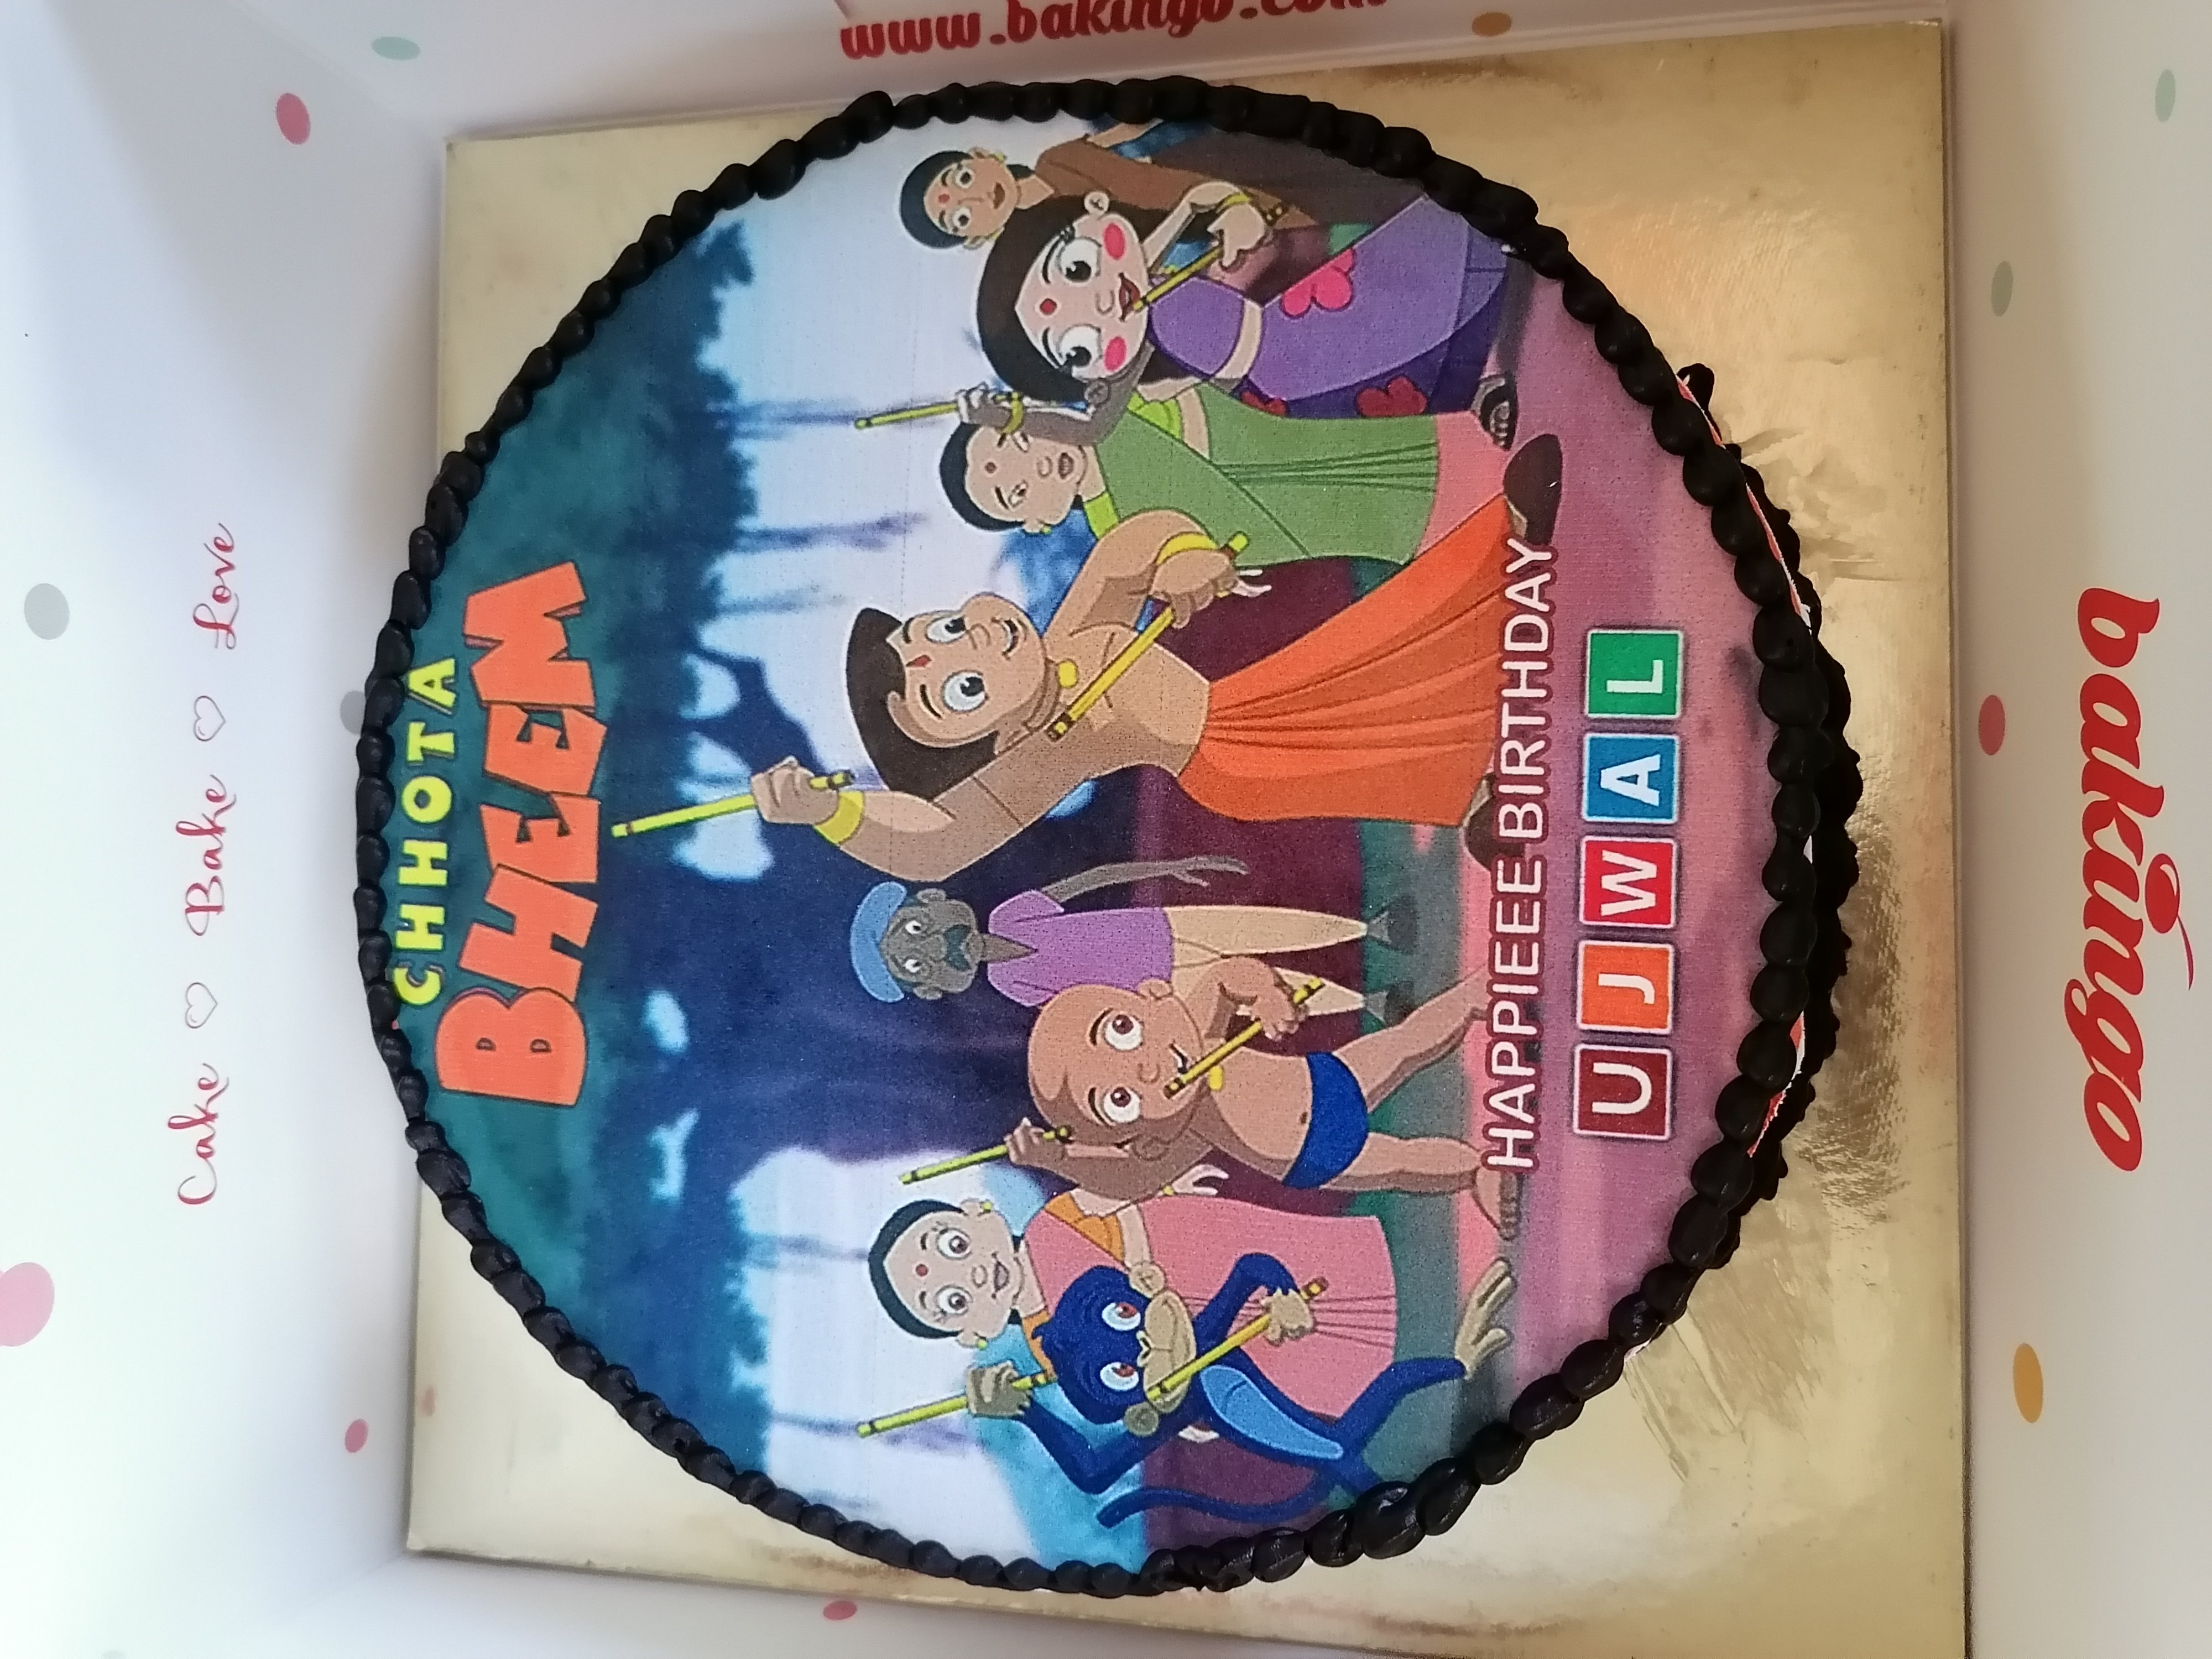 Customisable Chota Bheem Poster Cake